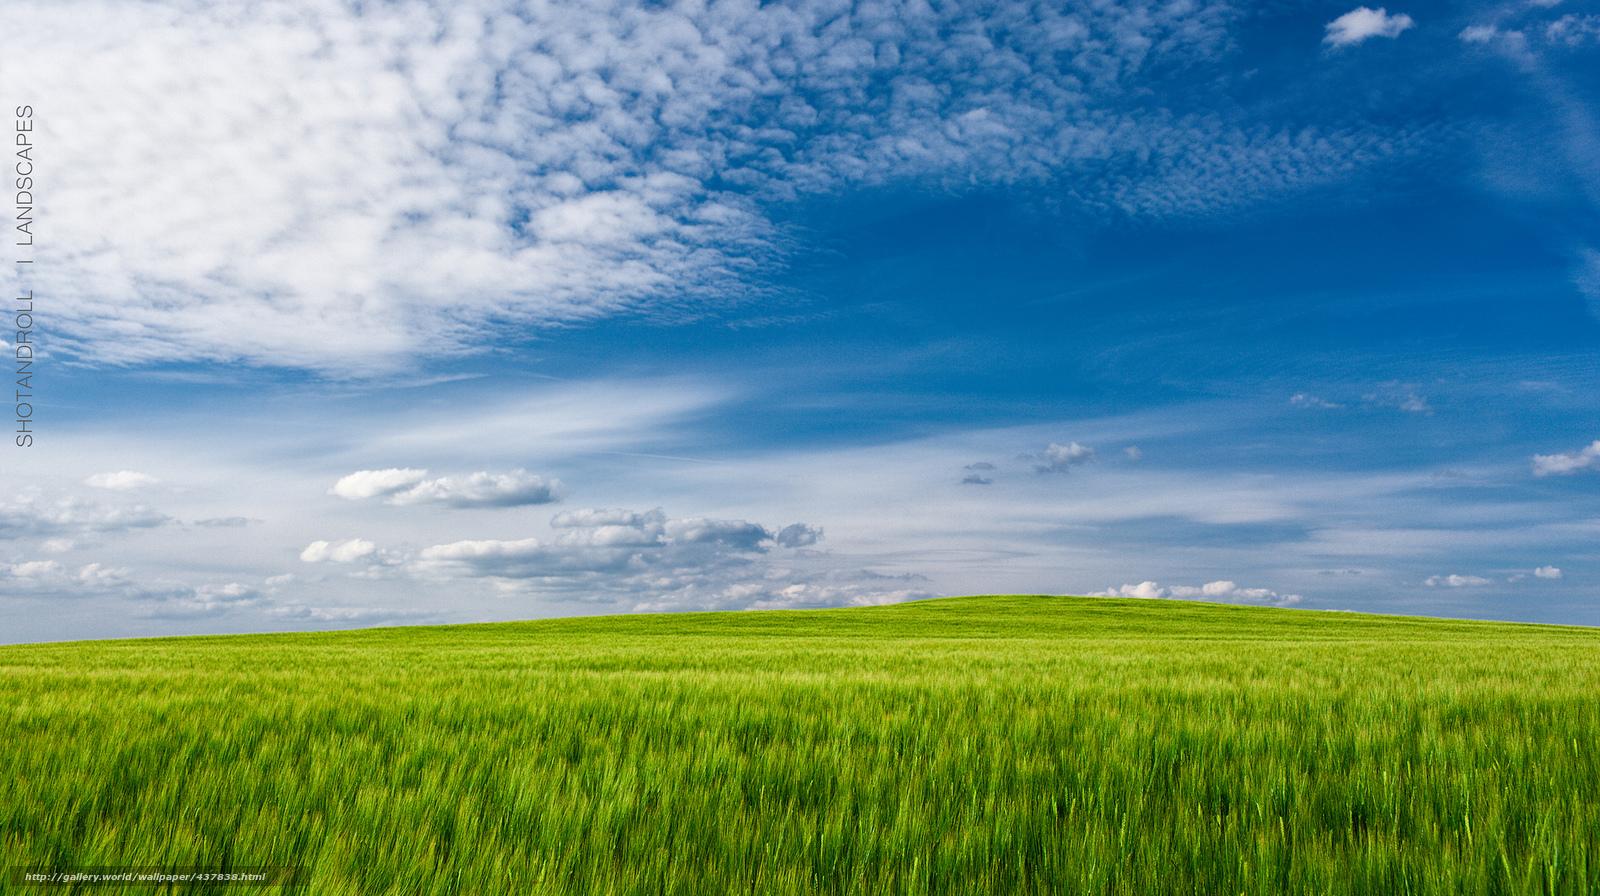 Tlcharger fond d 39 ecran champ vert herbe ciel paysage for Paysage vert